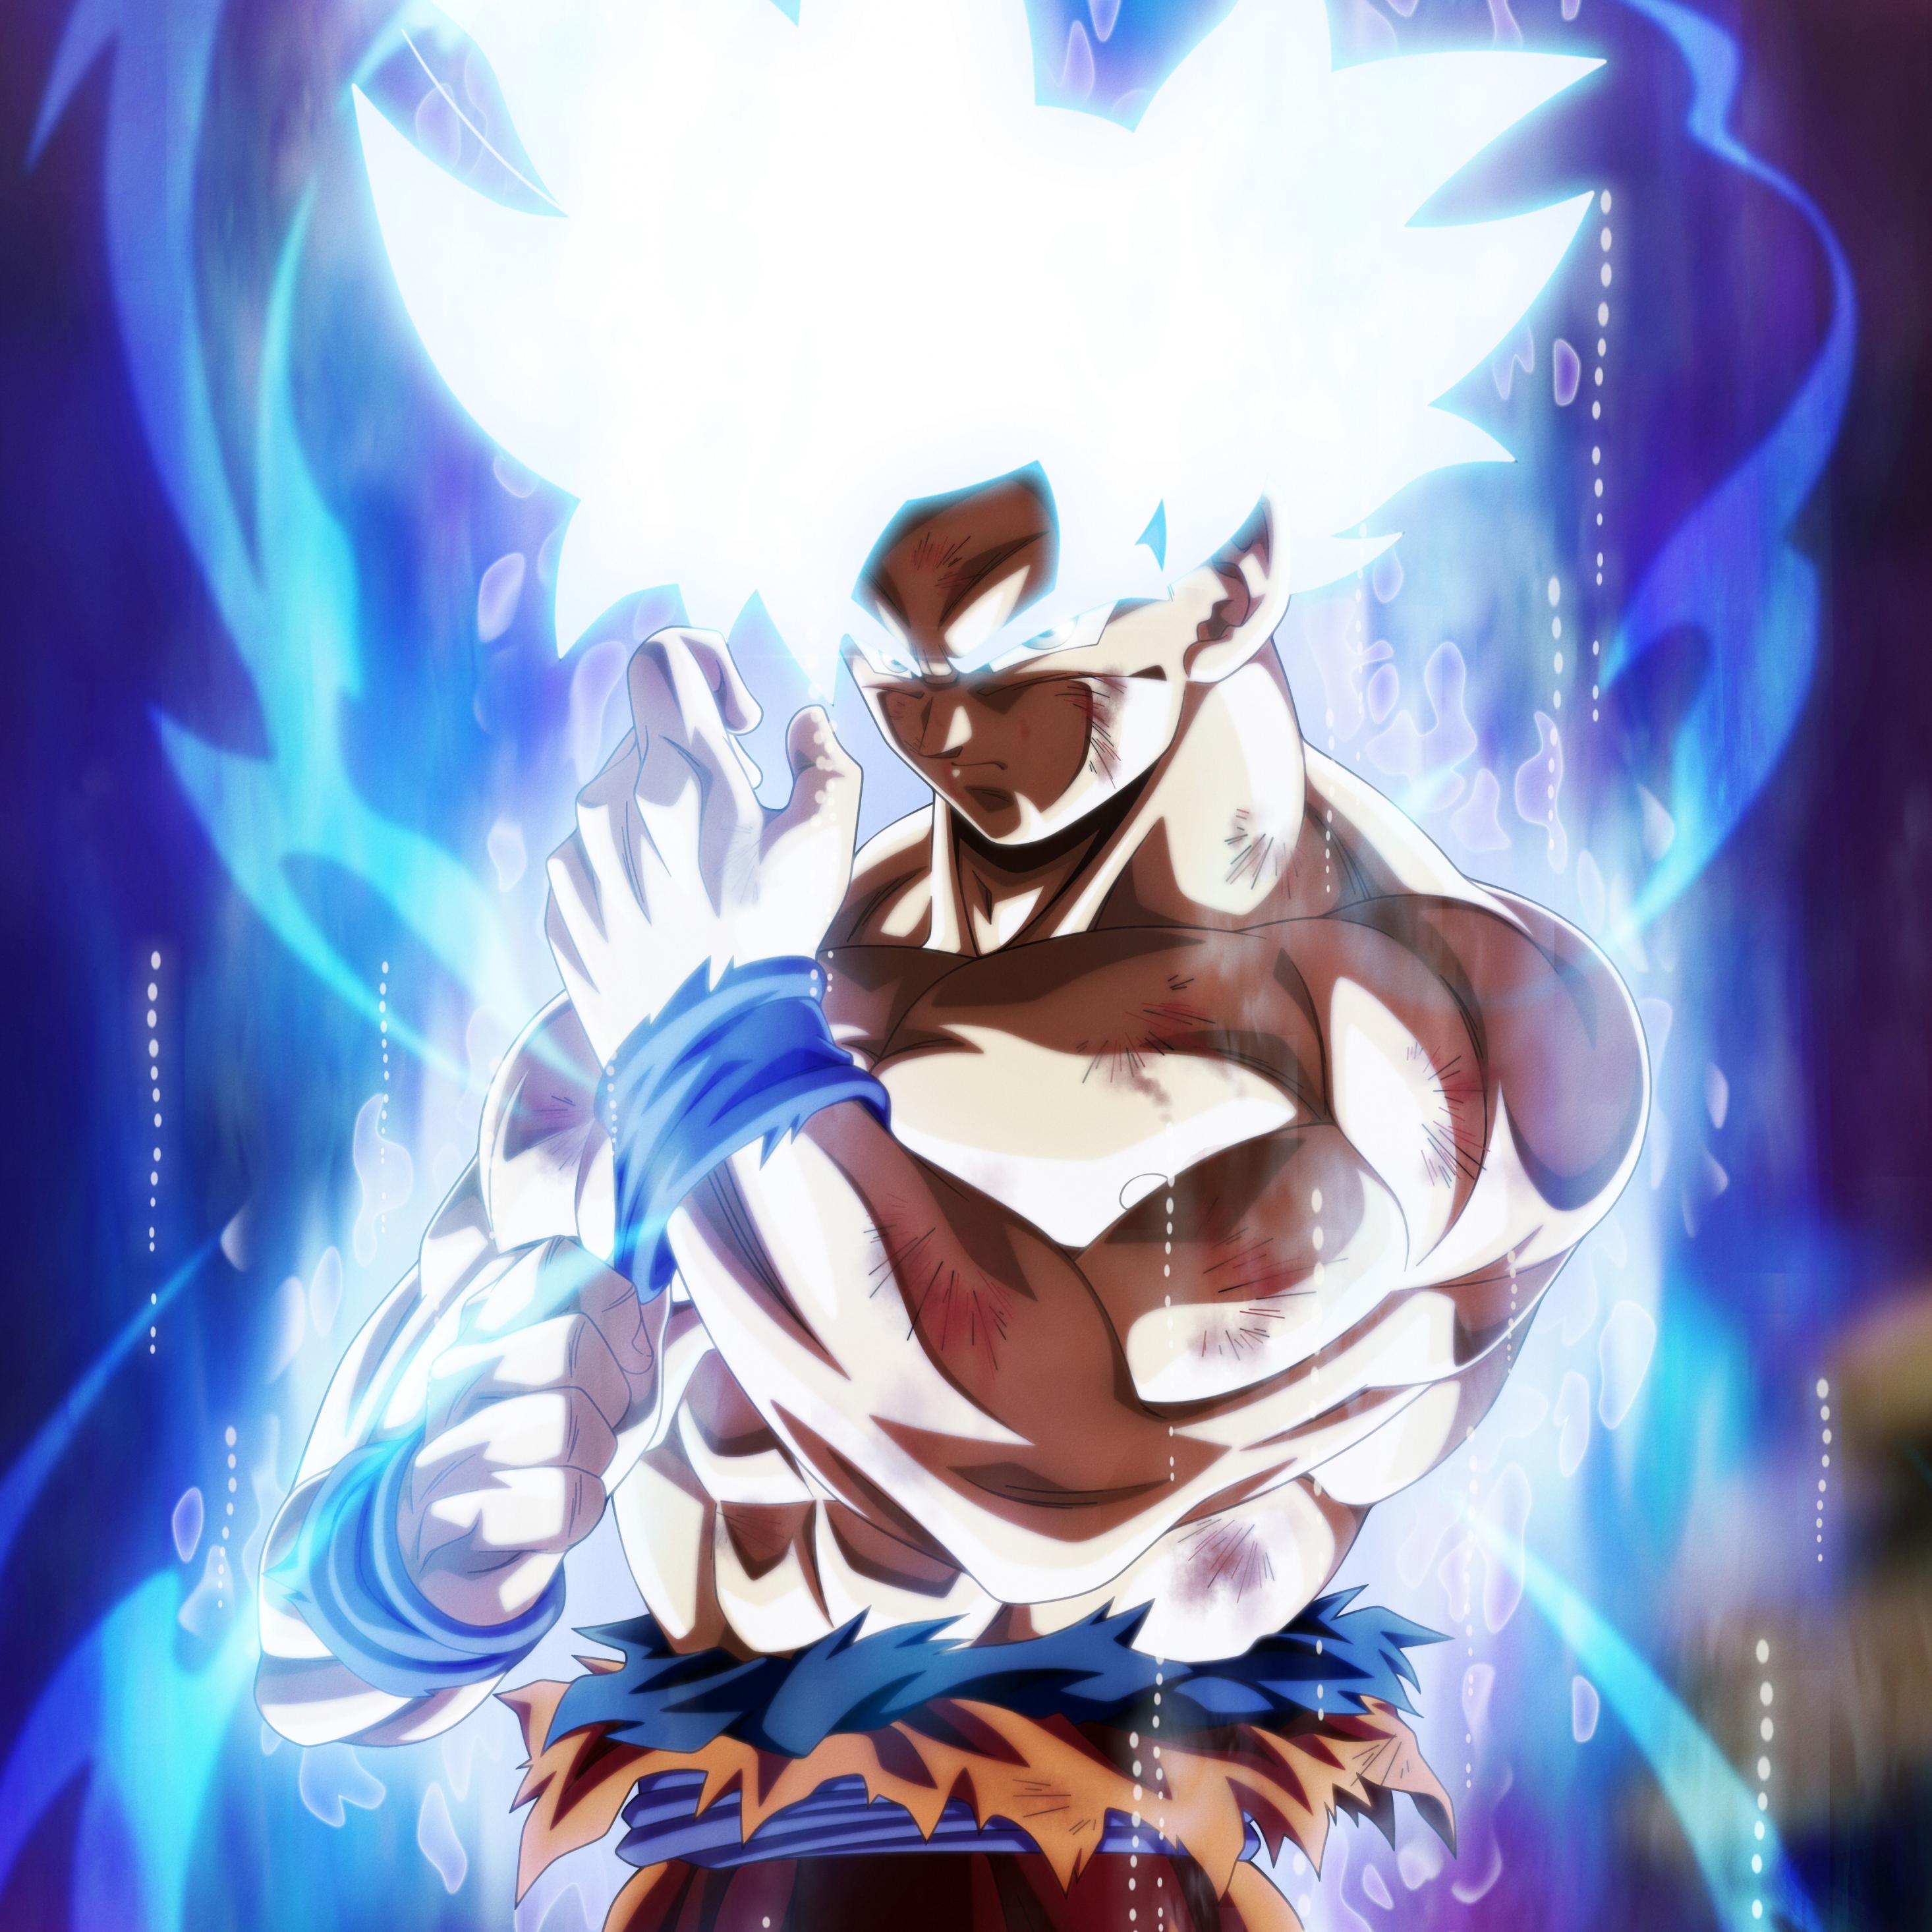 Dragon Ball Super Christmas Wallpaper: Download 2932x2932 Wallpaper Goku, Dragon Ball Super, Fan